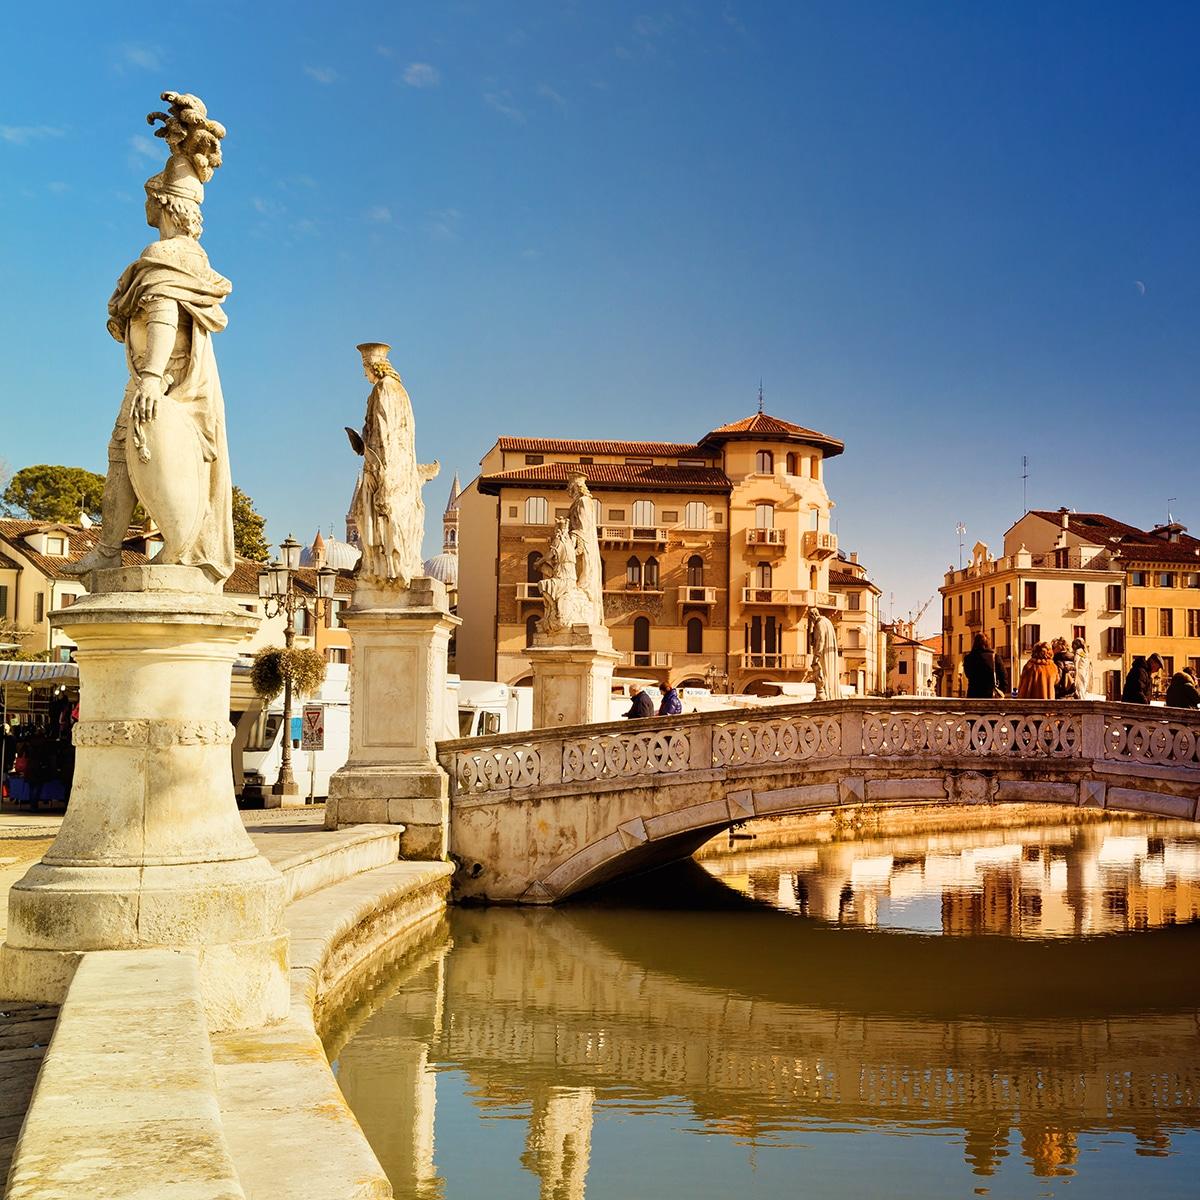 Veneto - Dream of Italy